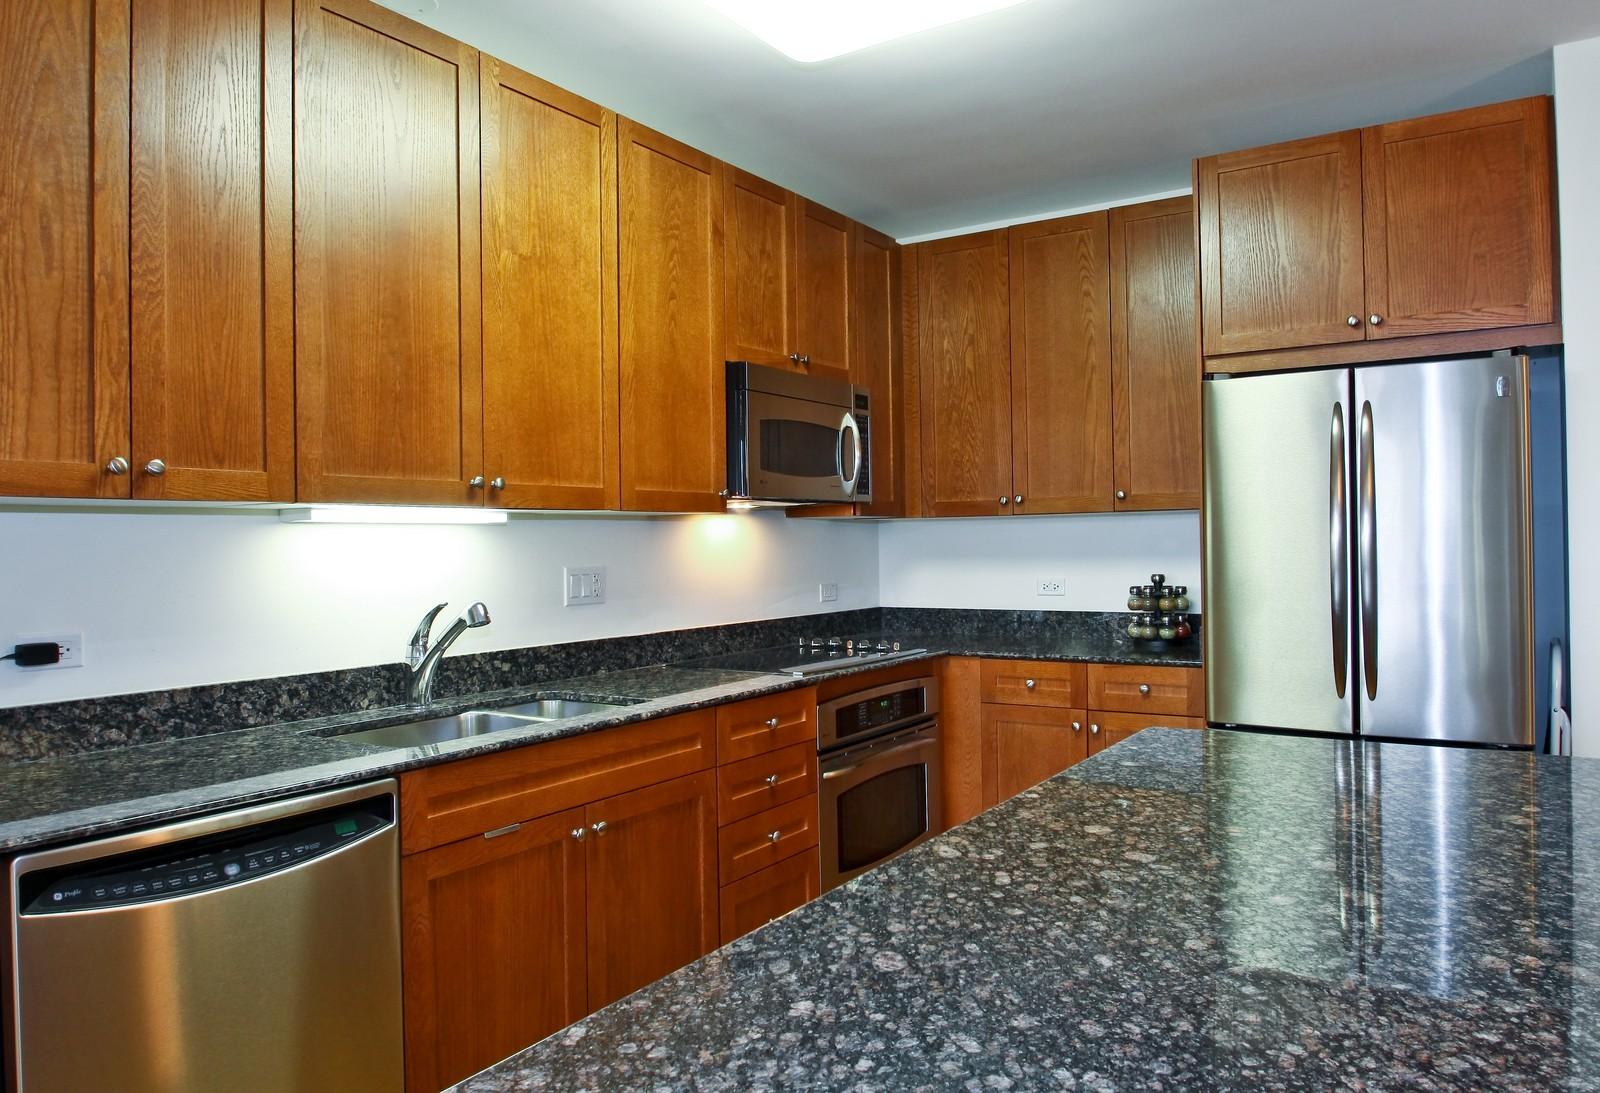 Real Estate Photography - 807 Davis, Evanston, IL, 60201 - Kitchen